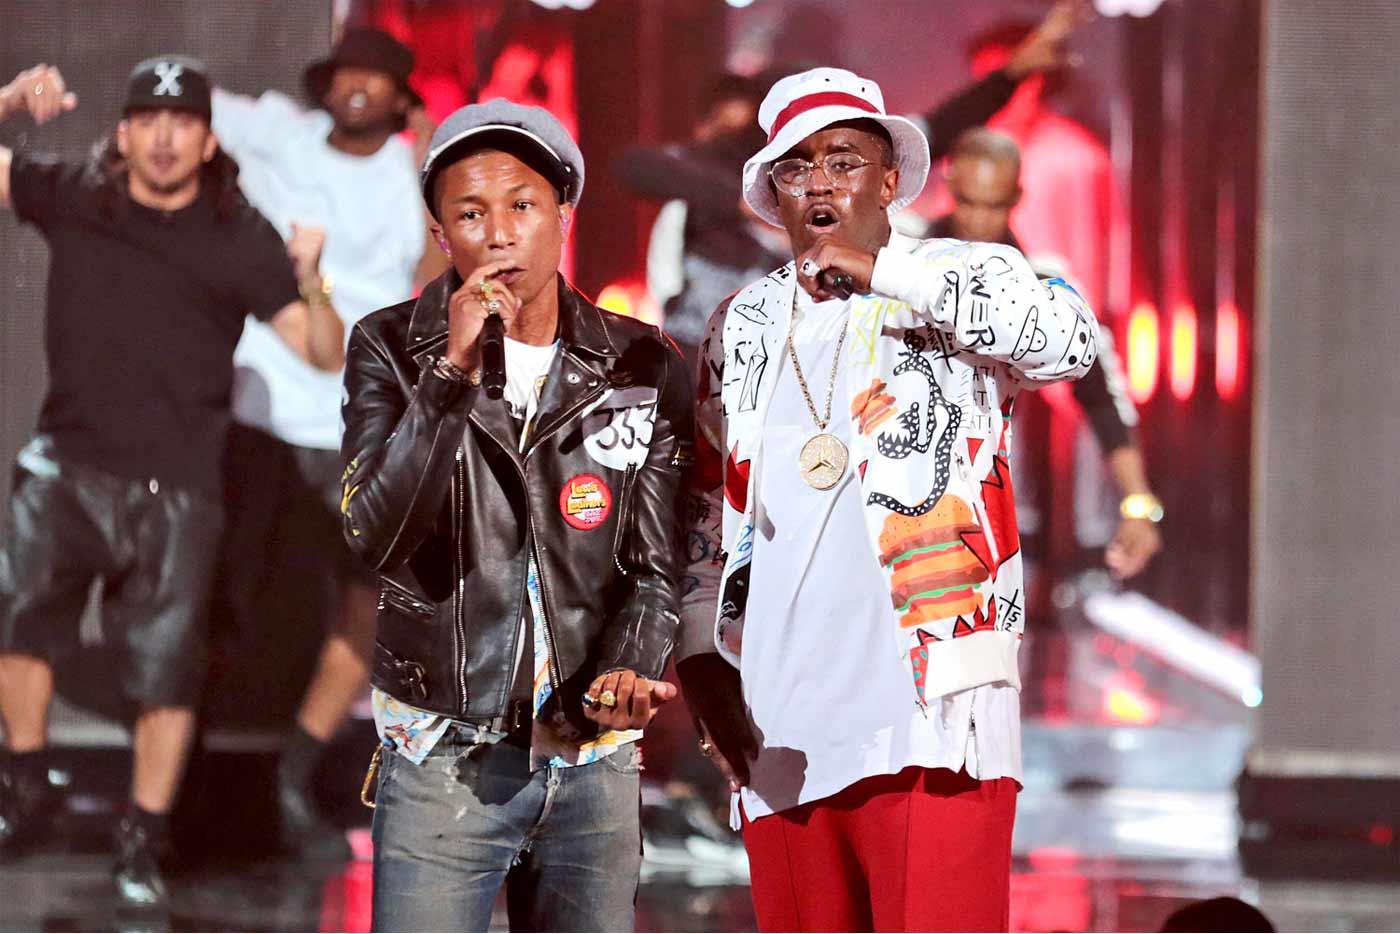 Escucha lo nuevo de Puff Daddy y Pharrell